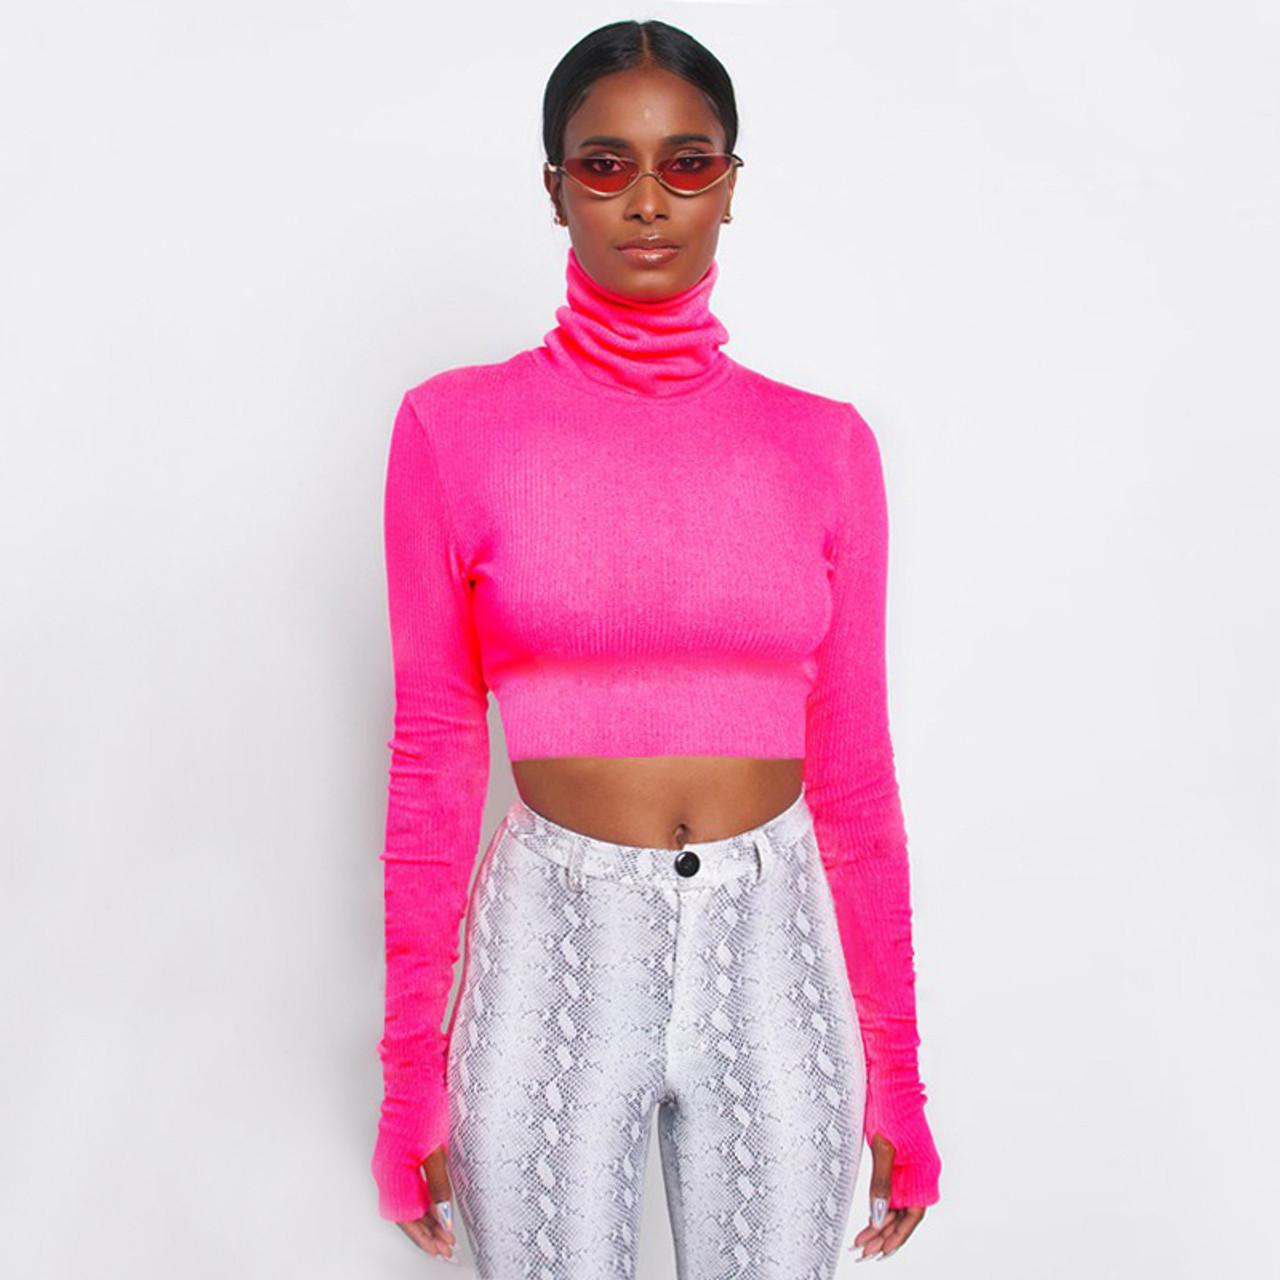 659cfef1 Women Turtleneck Ribbed Sweatshirt Long Sleeve Fluorescent Color Pullovers  Crop Slim Mujer Warm Knit Jumpers Short Tops {Hot Pink}